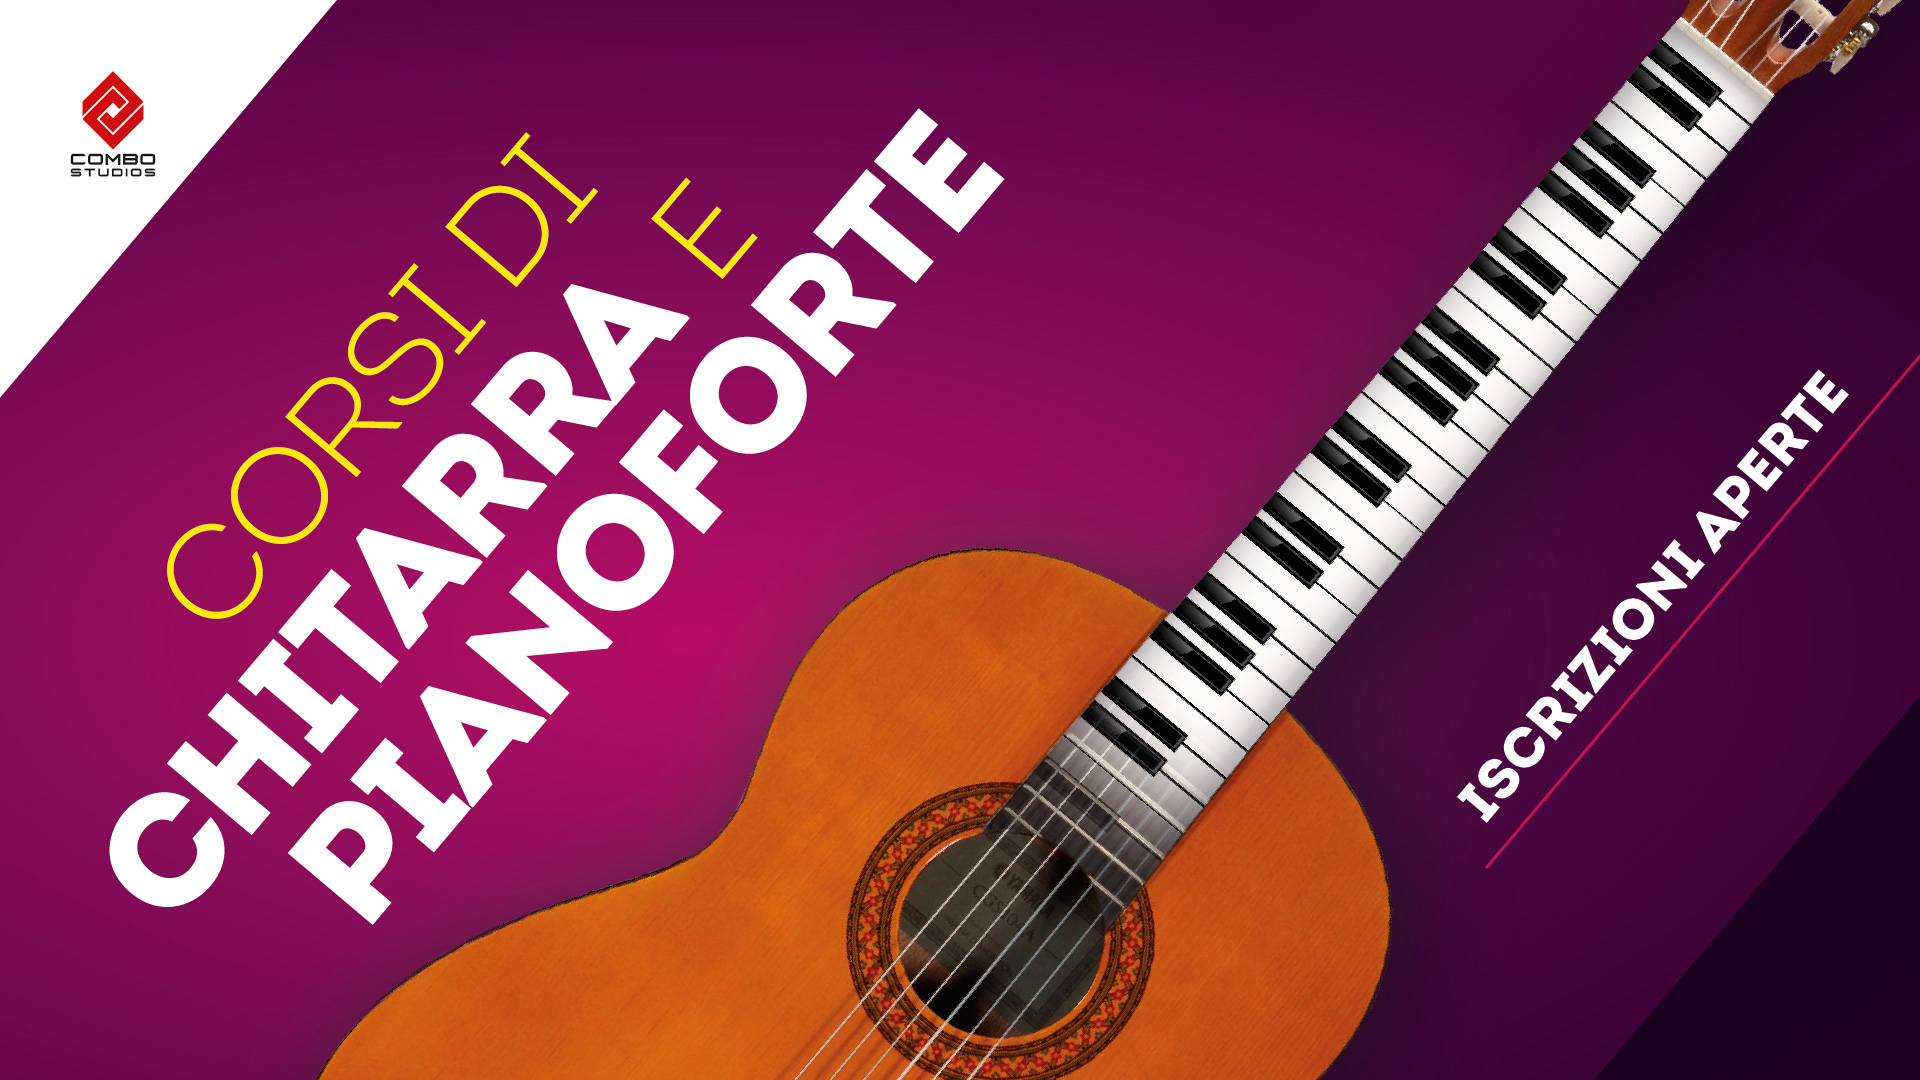 banner-corso-chitarra-2017